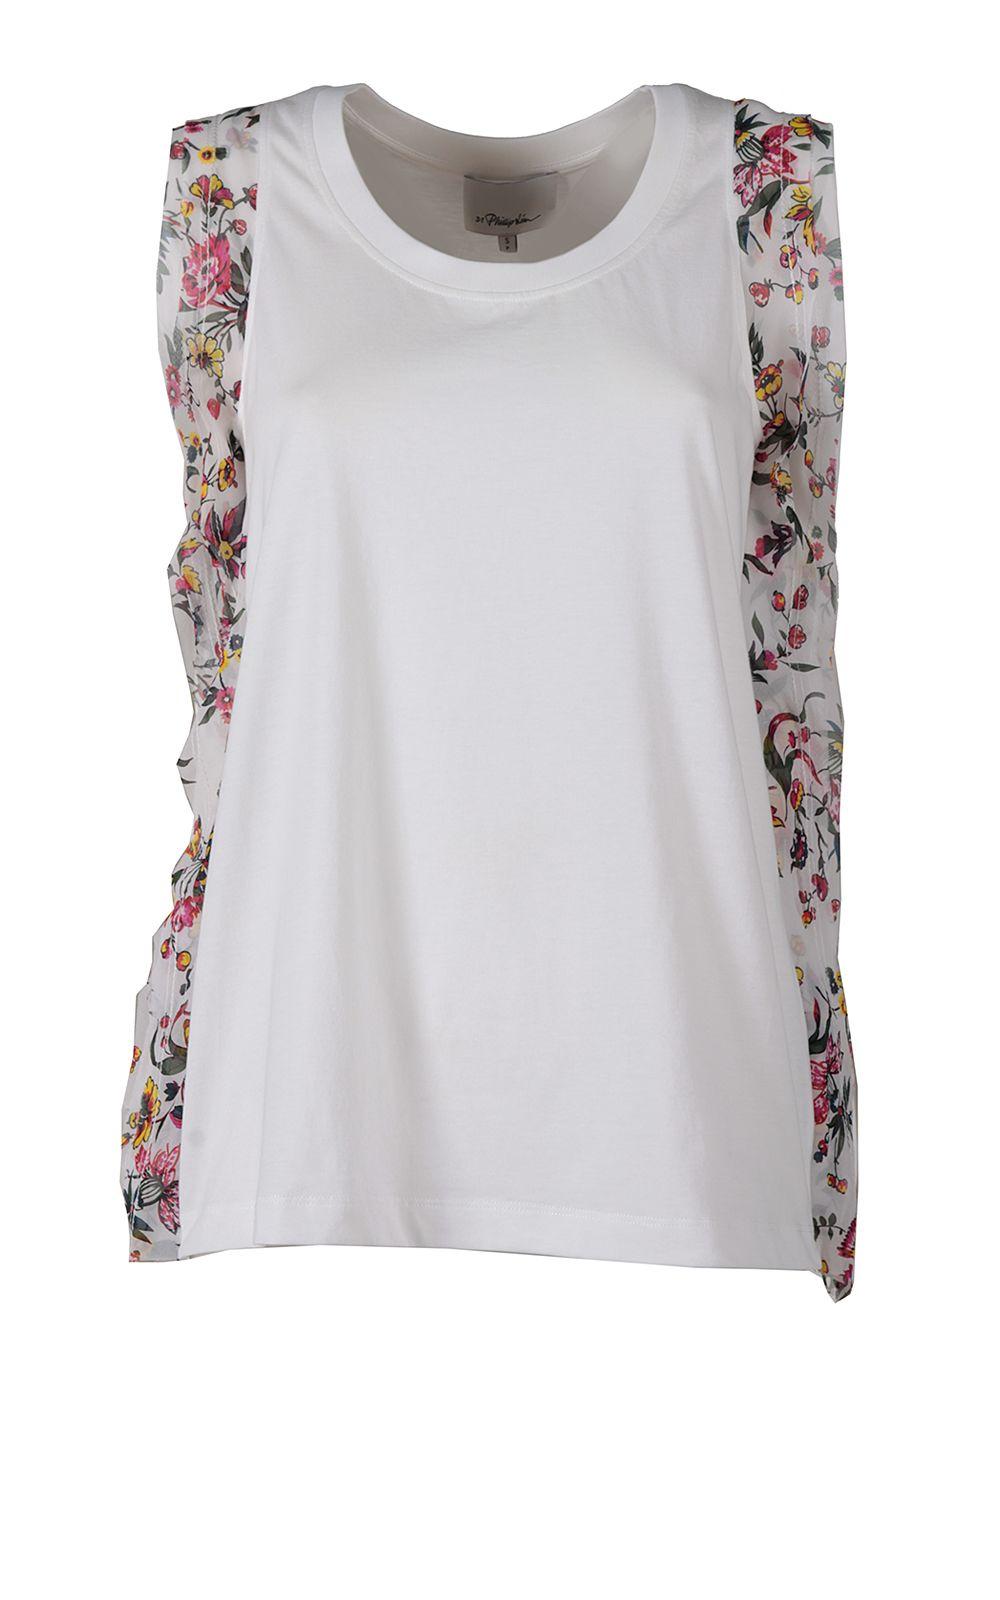 e283441d0a426 3.1 Phillip Lim Floral Silk-ruffle Cotton-jersey Tank Top - White ...